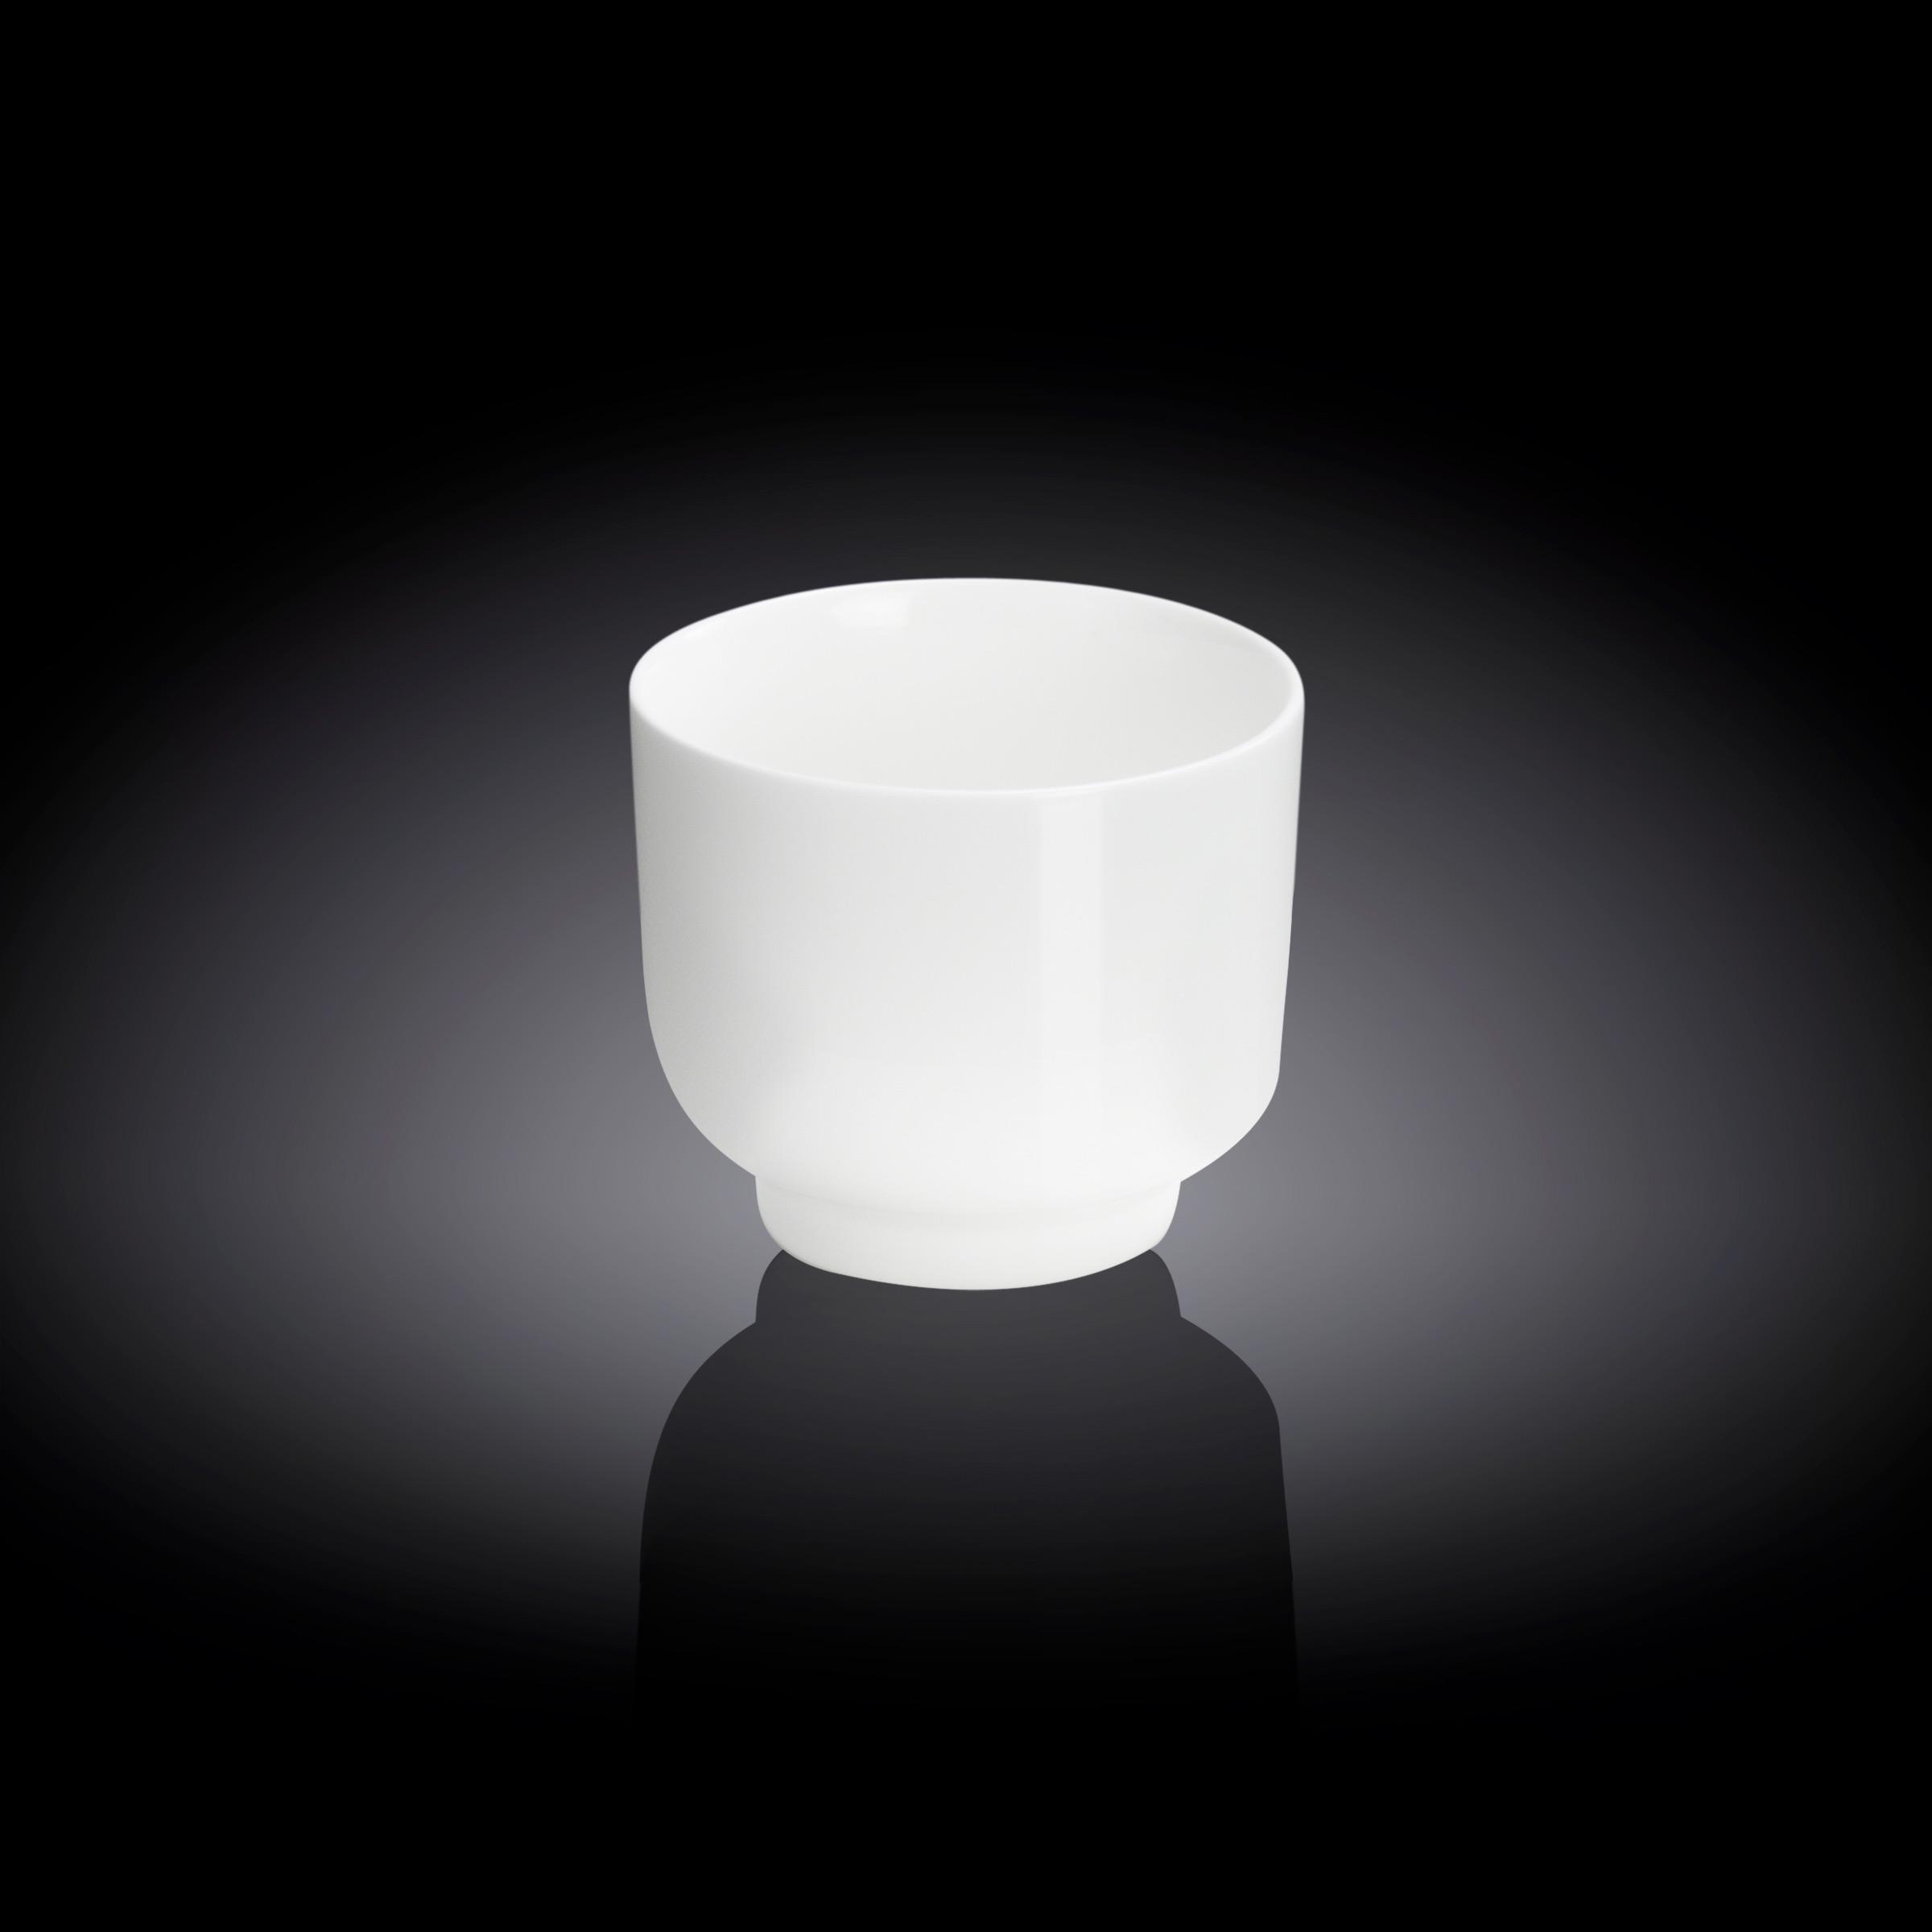 -Lora Collection- ティーカップ 32262 (WL-993021/A)